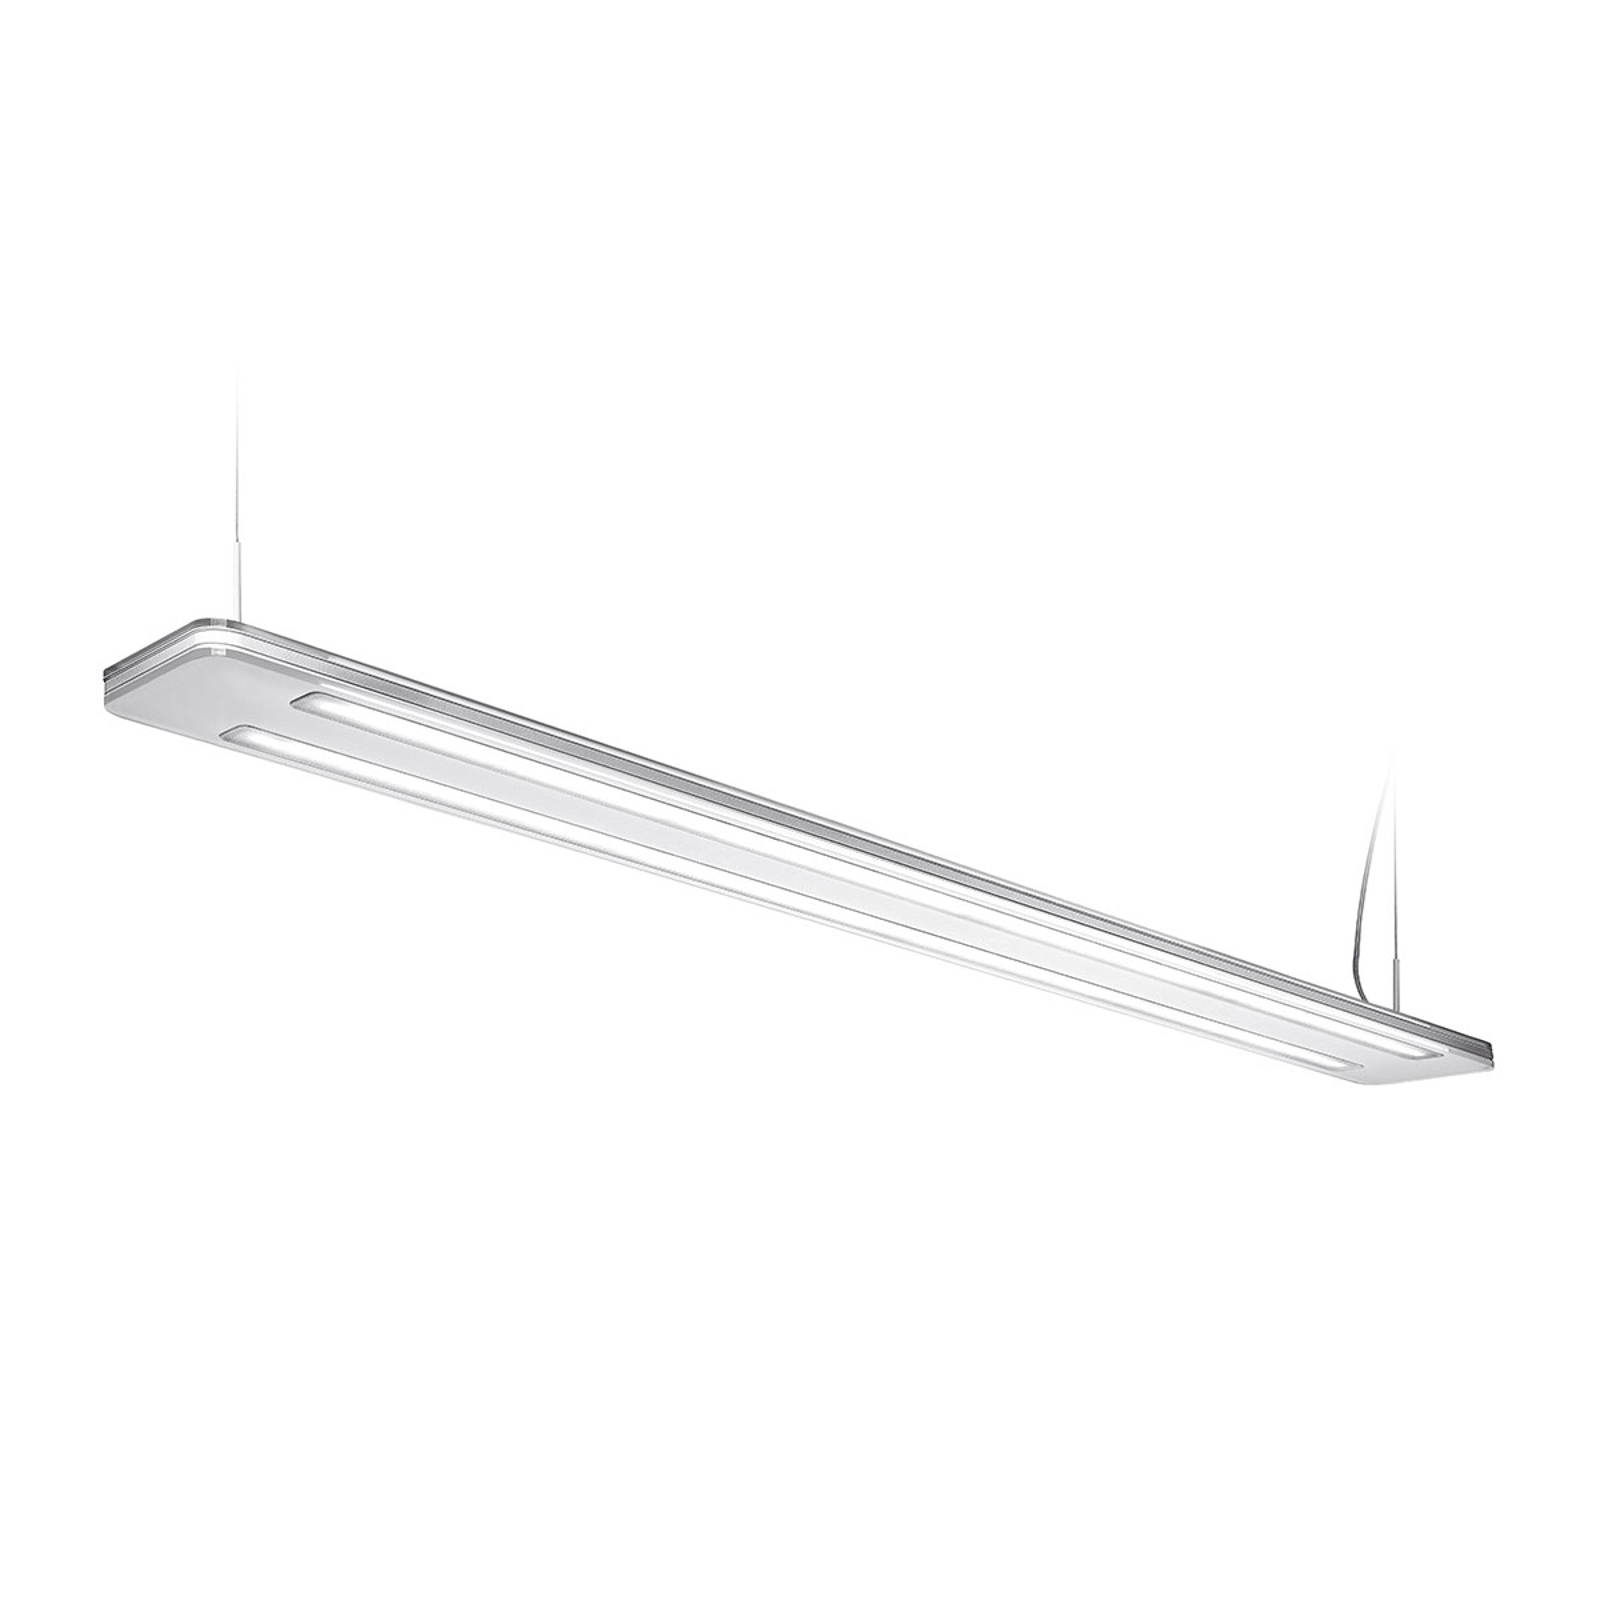 LED-Pendelleuchte Trentino II, 156 W, weiß